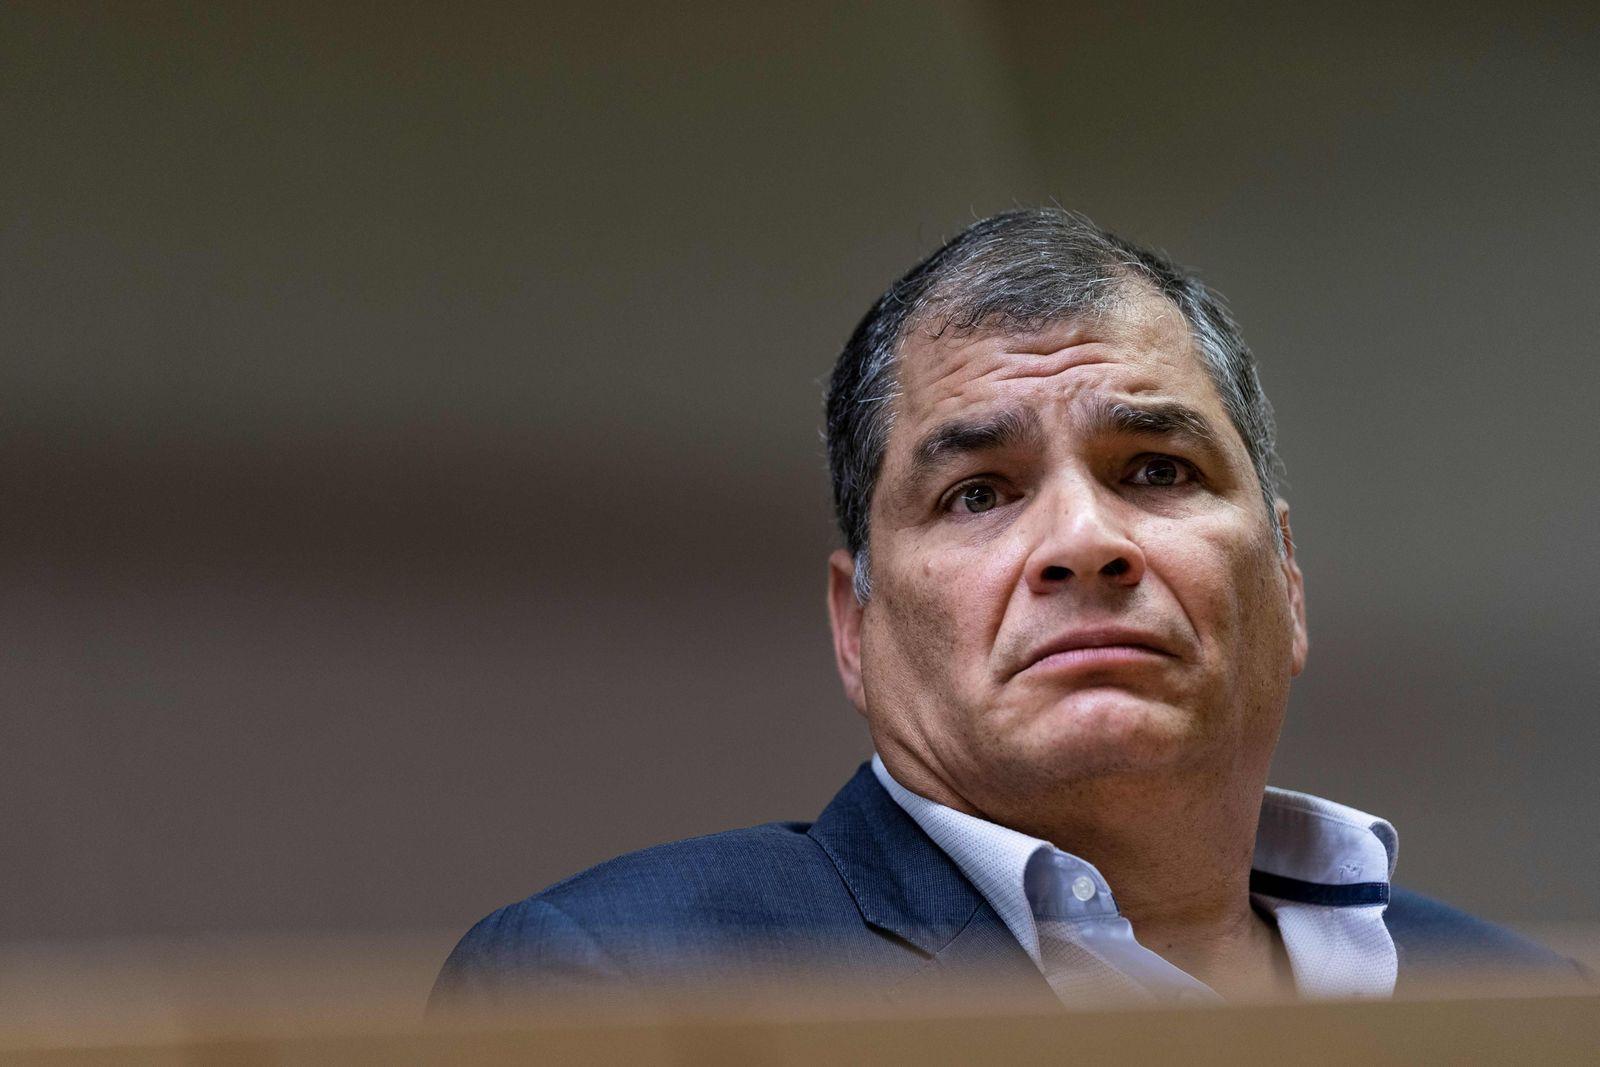 FILES-ECUADOR-POLITICS-CORRUPTION-CORREA